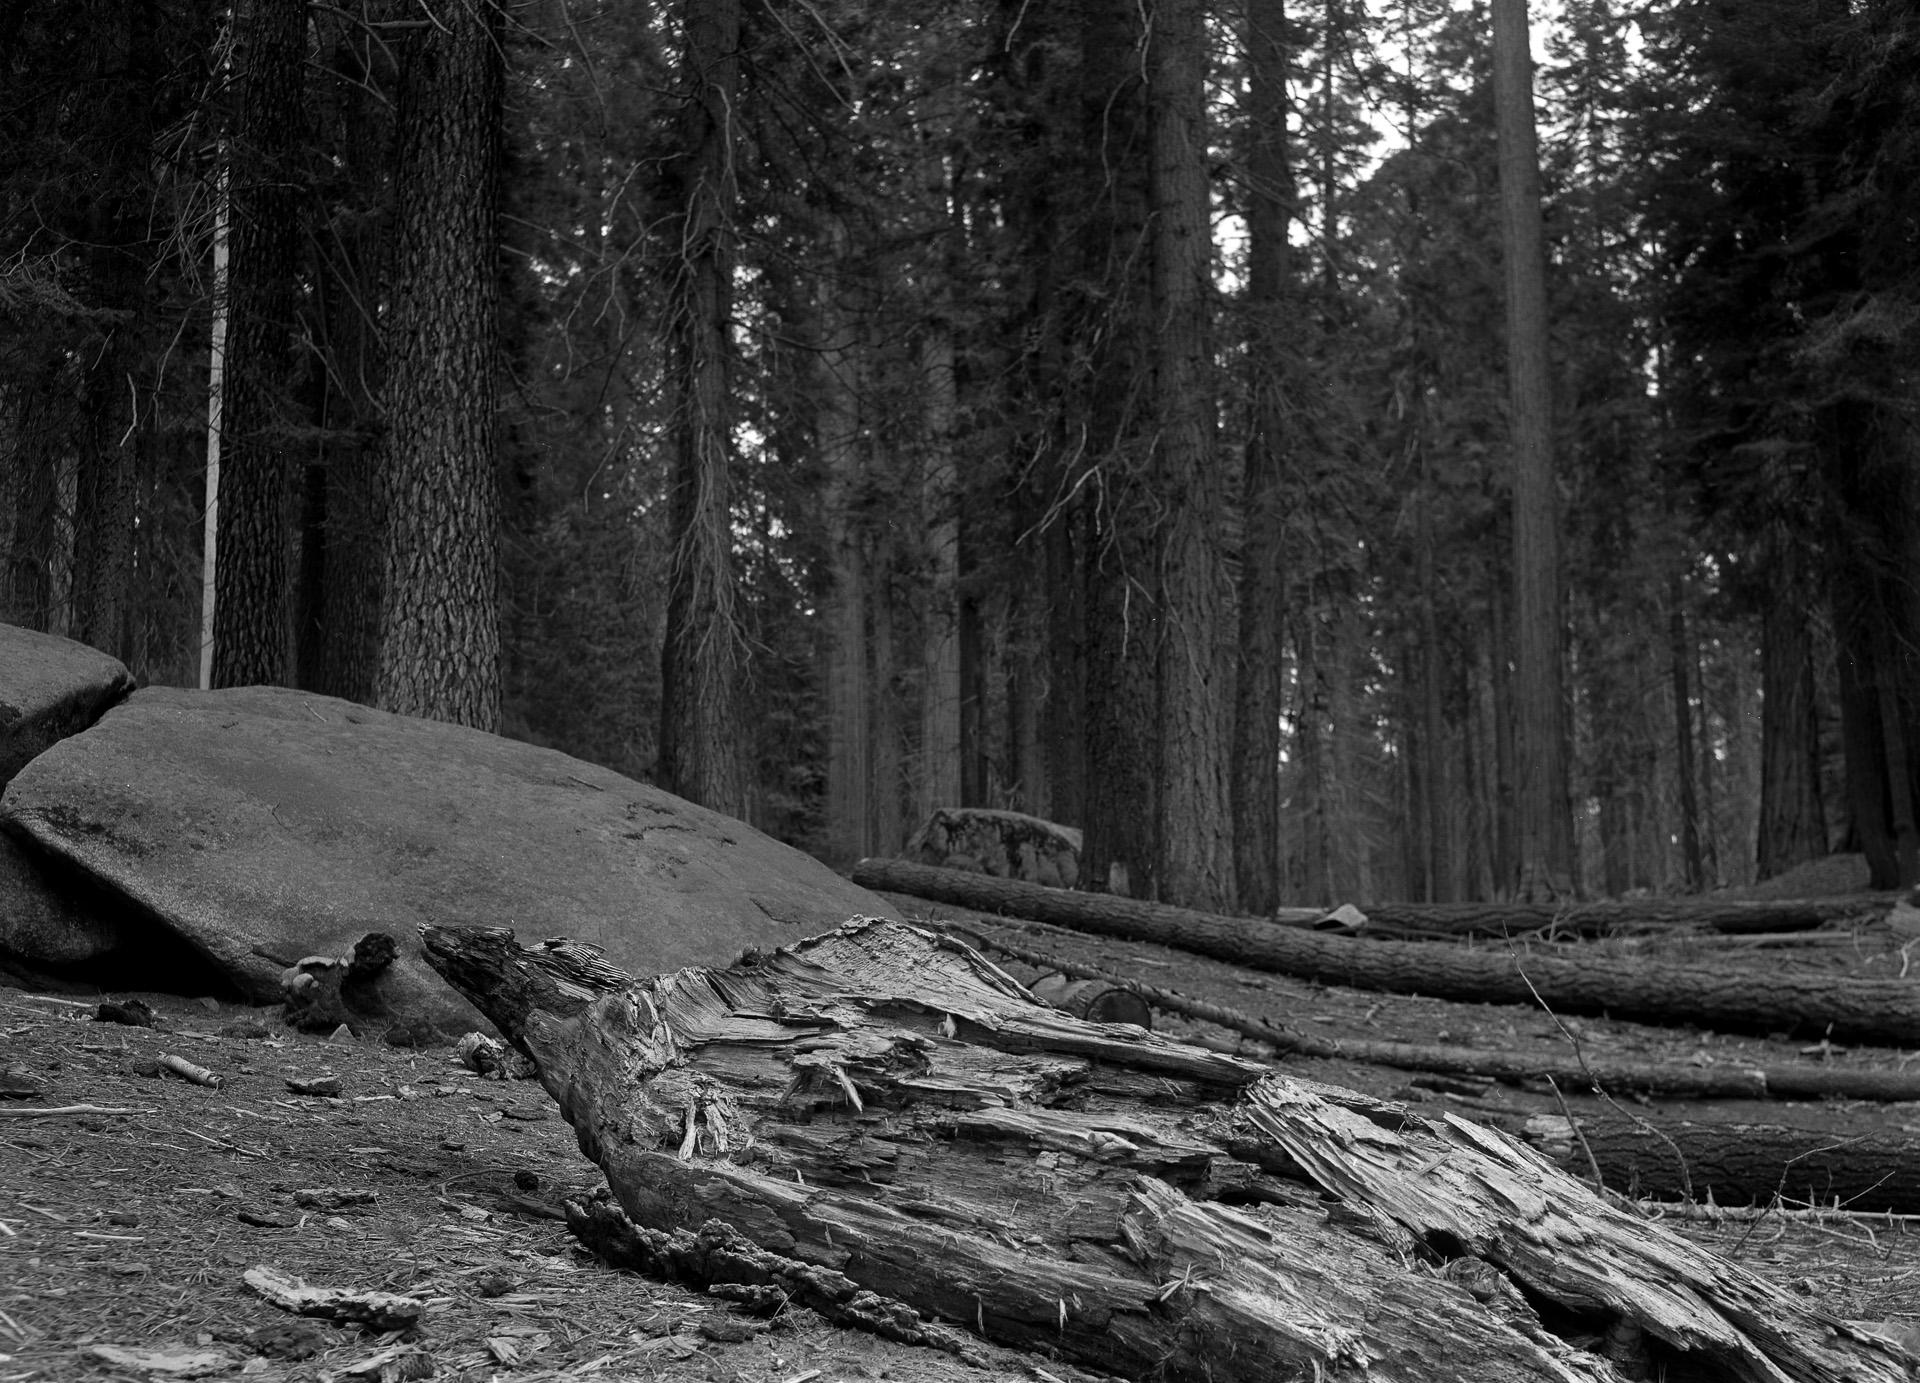 Forest Floor, Seqouia National Park